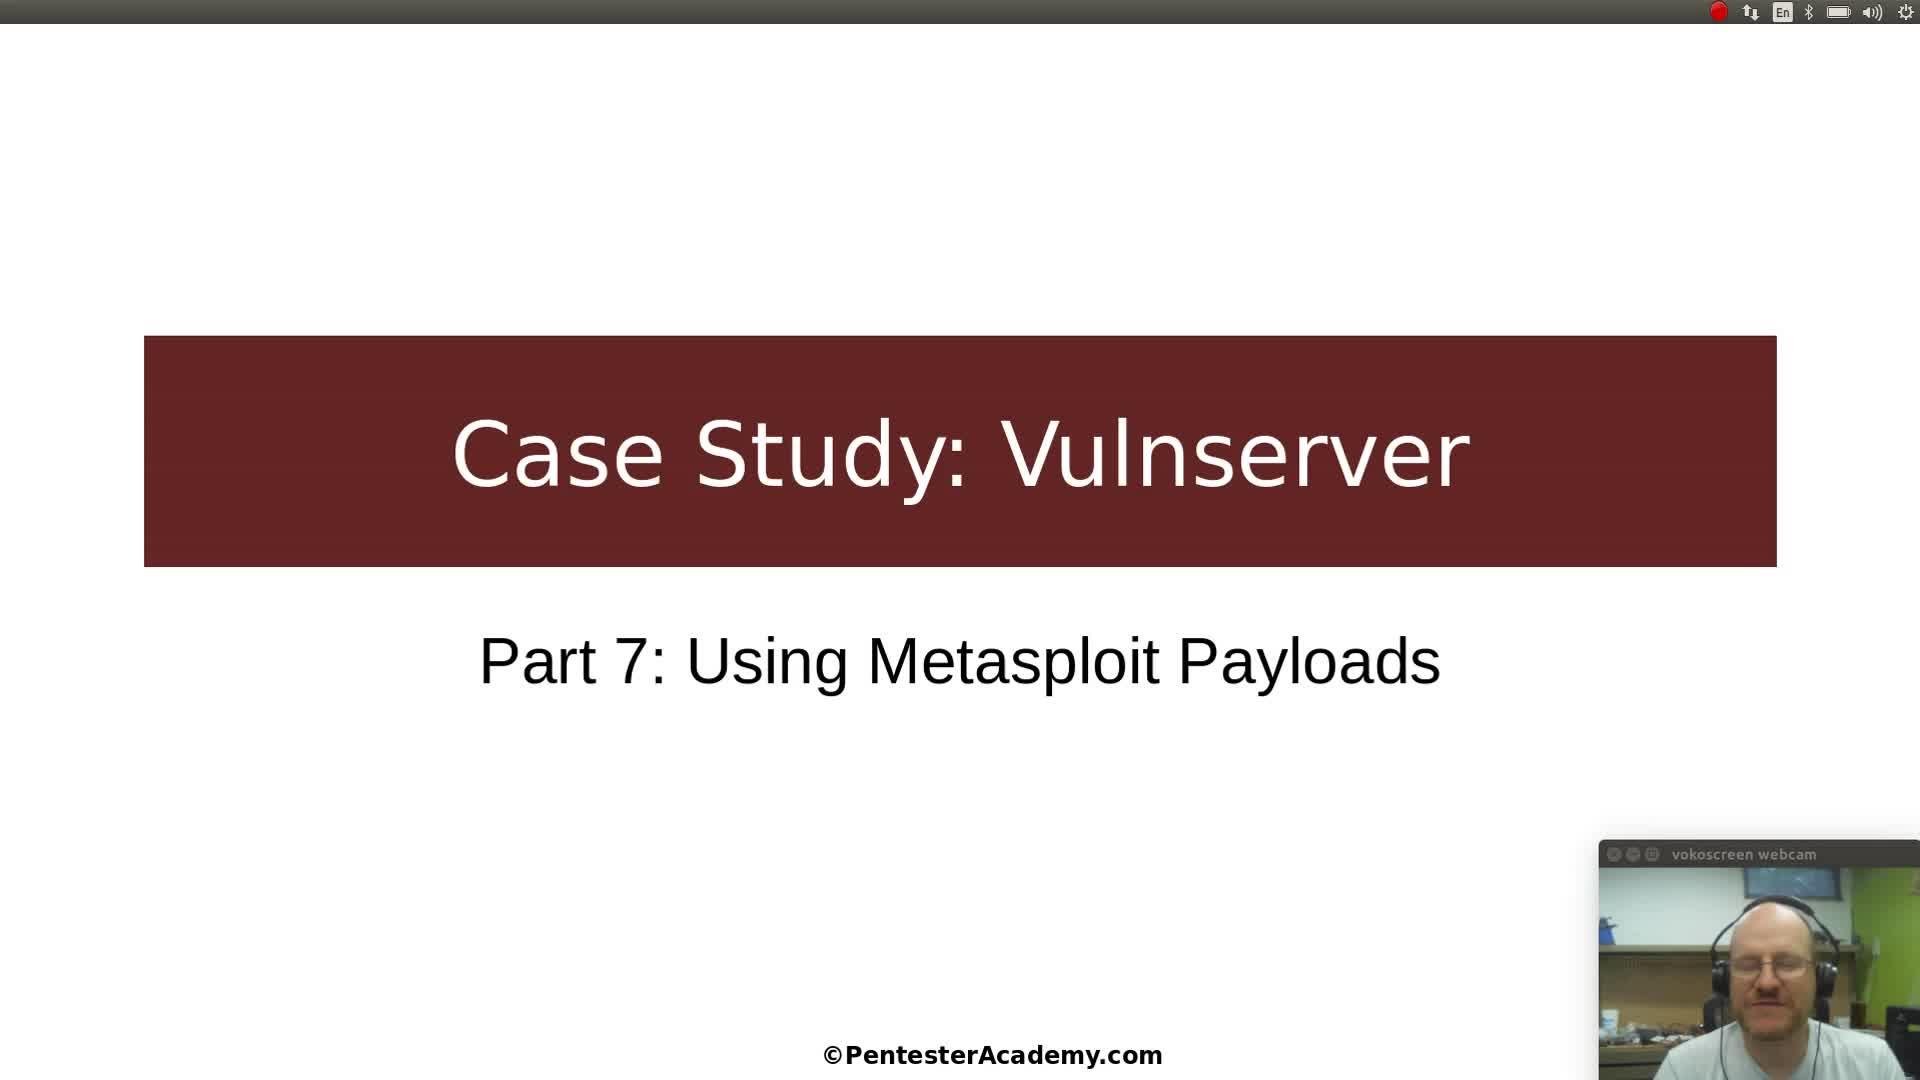 Case Study Vulnserver Part 7: Using Metasploit Payloads